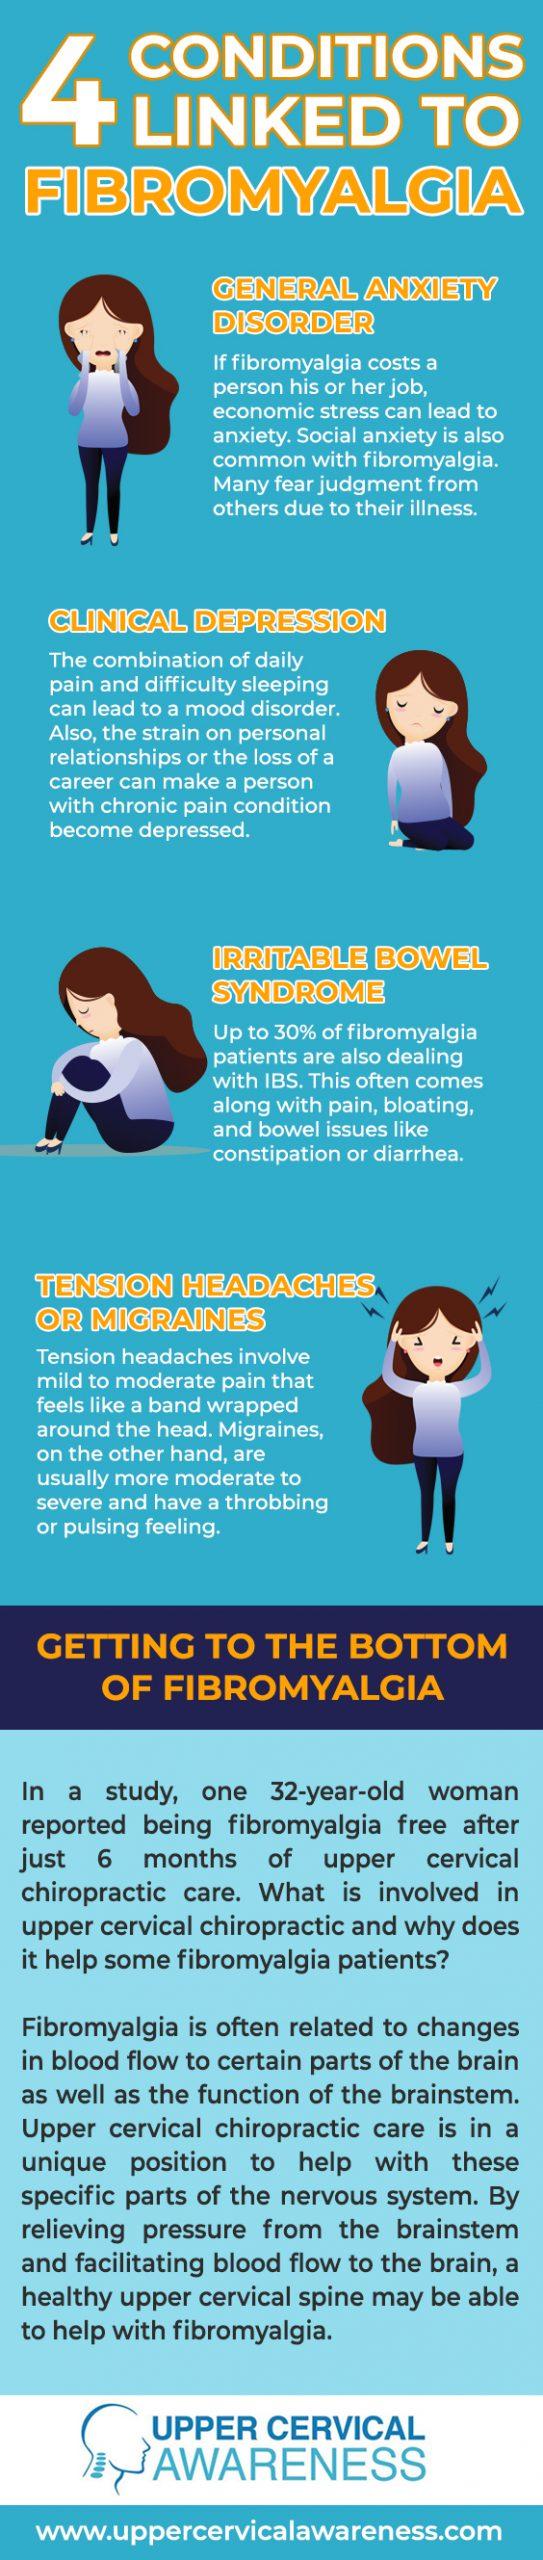 devastating-associated-conditions-linked-fibromyalgia-scaled